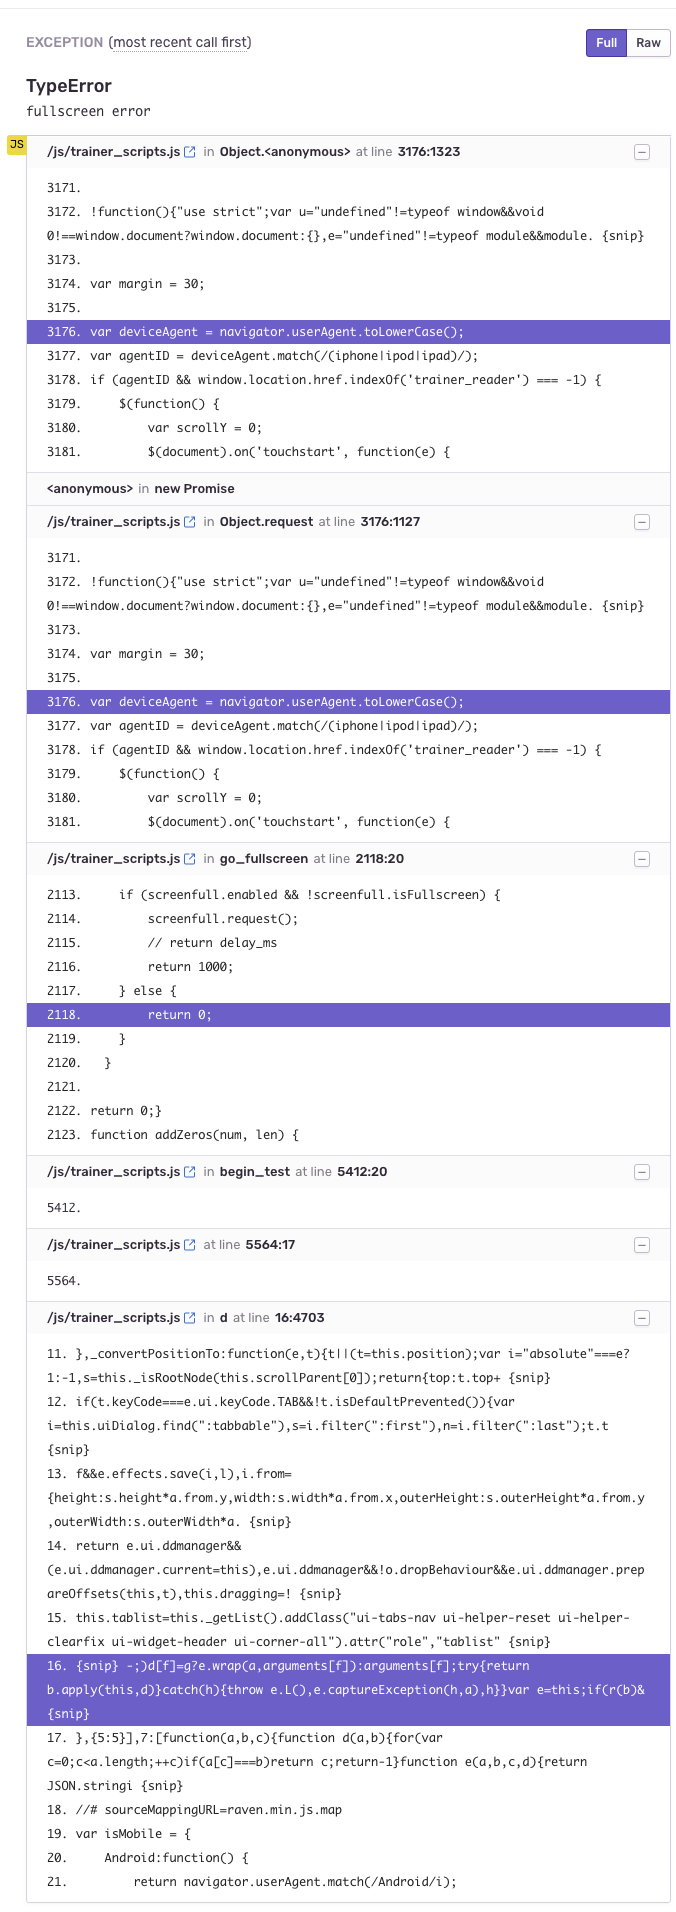 TypeError: fullscreen error · Issue #122 · sindresorhus/screenfull